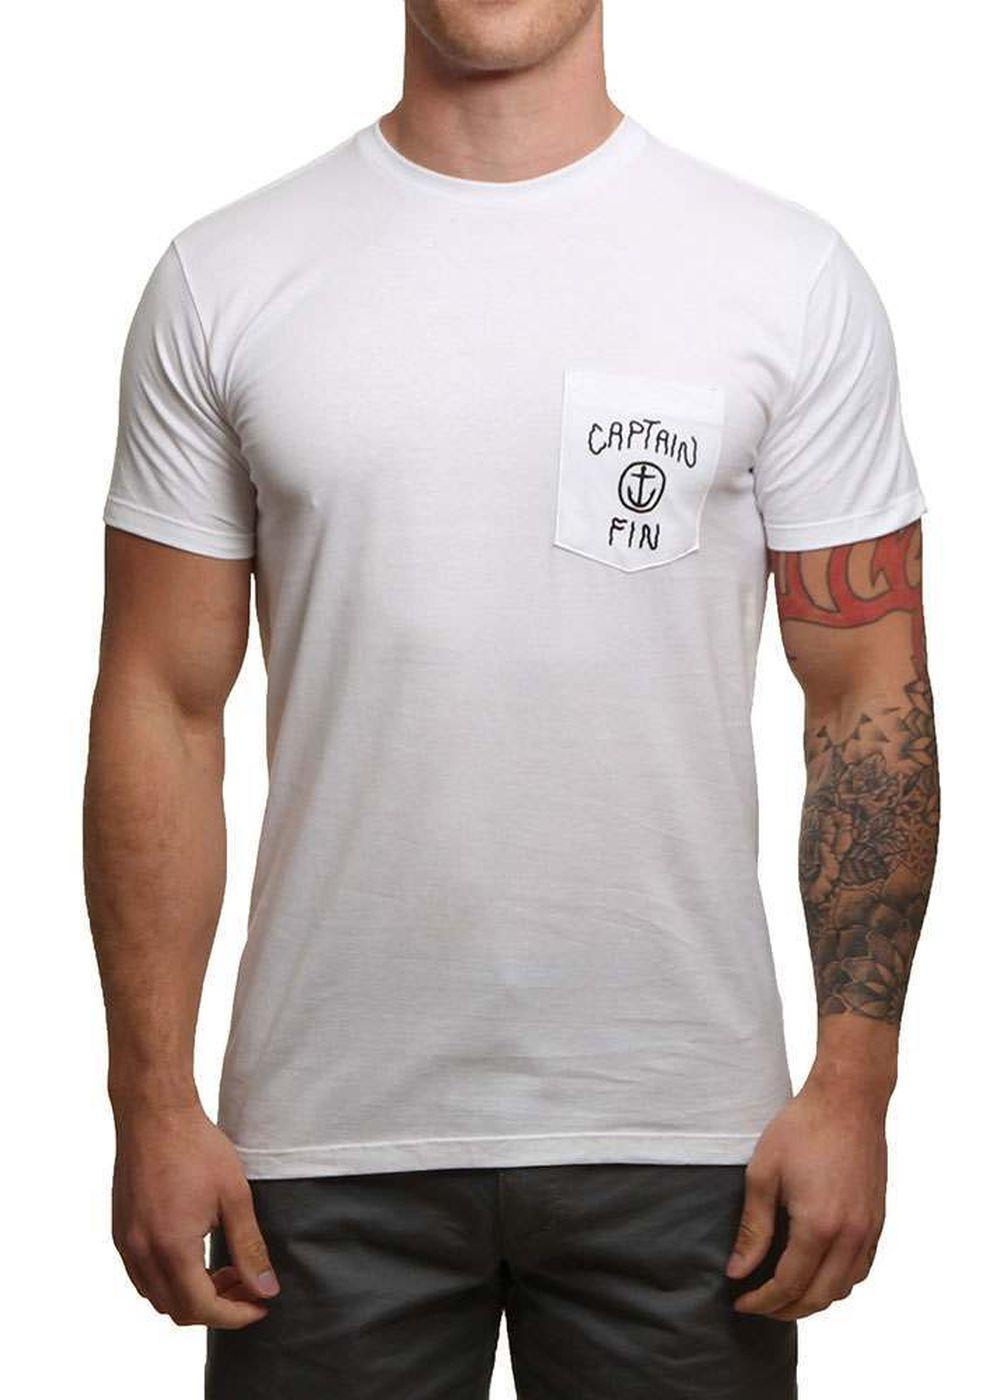 captain-fin-water-world-tee-white